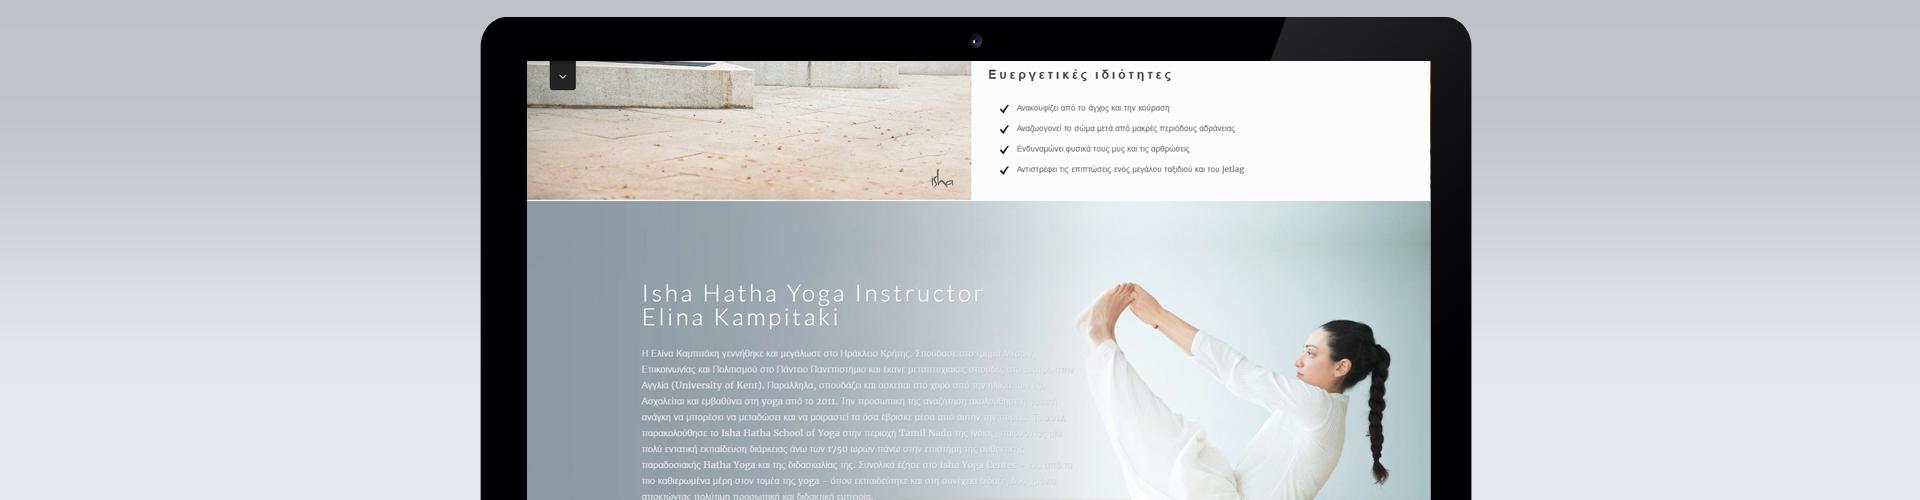 yogaseeds_web bio